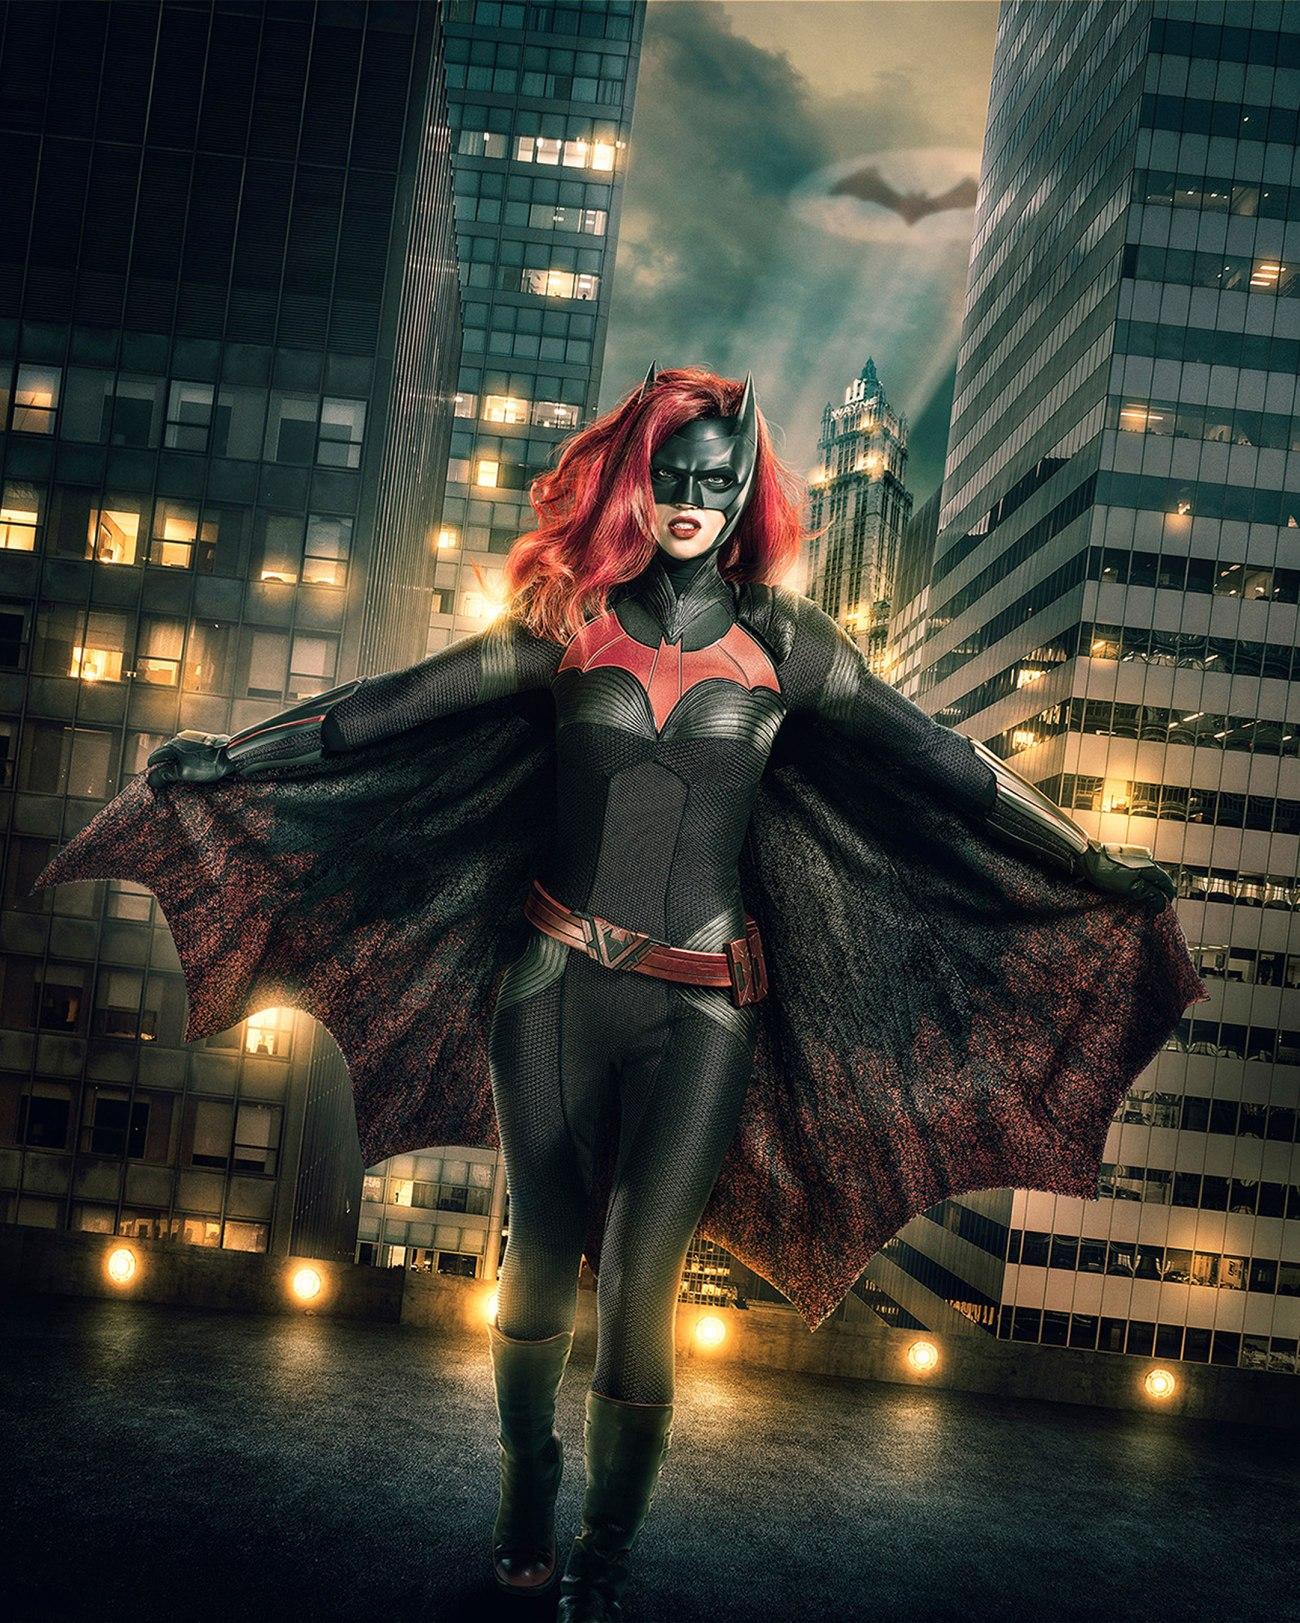 Batwoman (Ruby Rose) en el crossover Elseworlds. Imagen: JSquared Photography/The CW